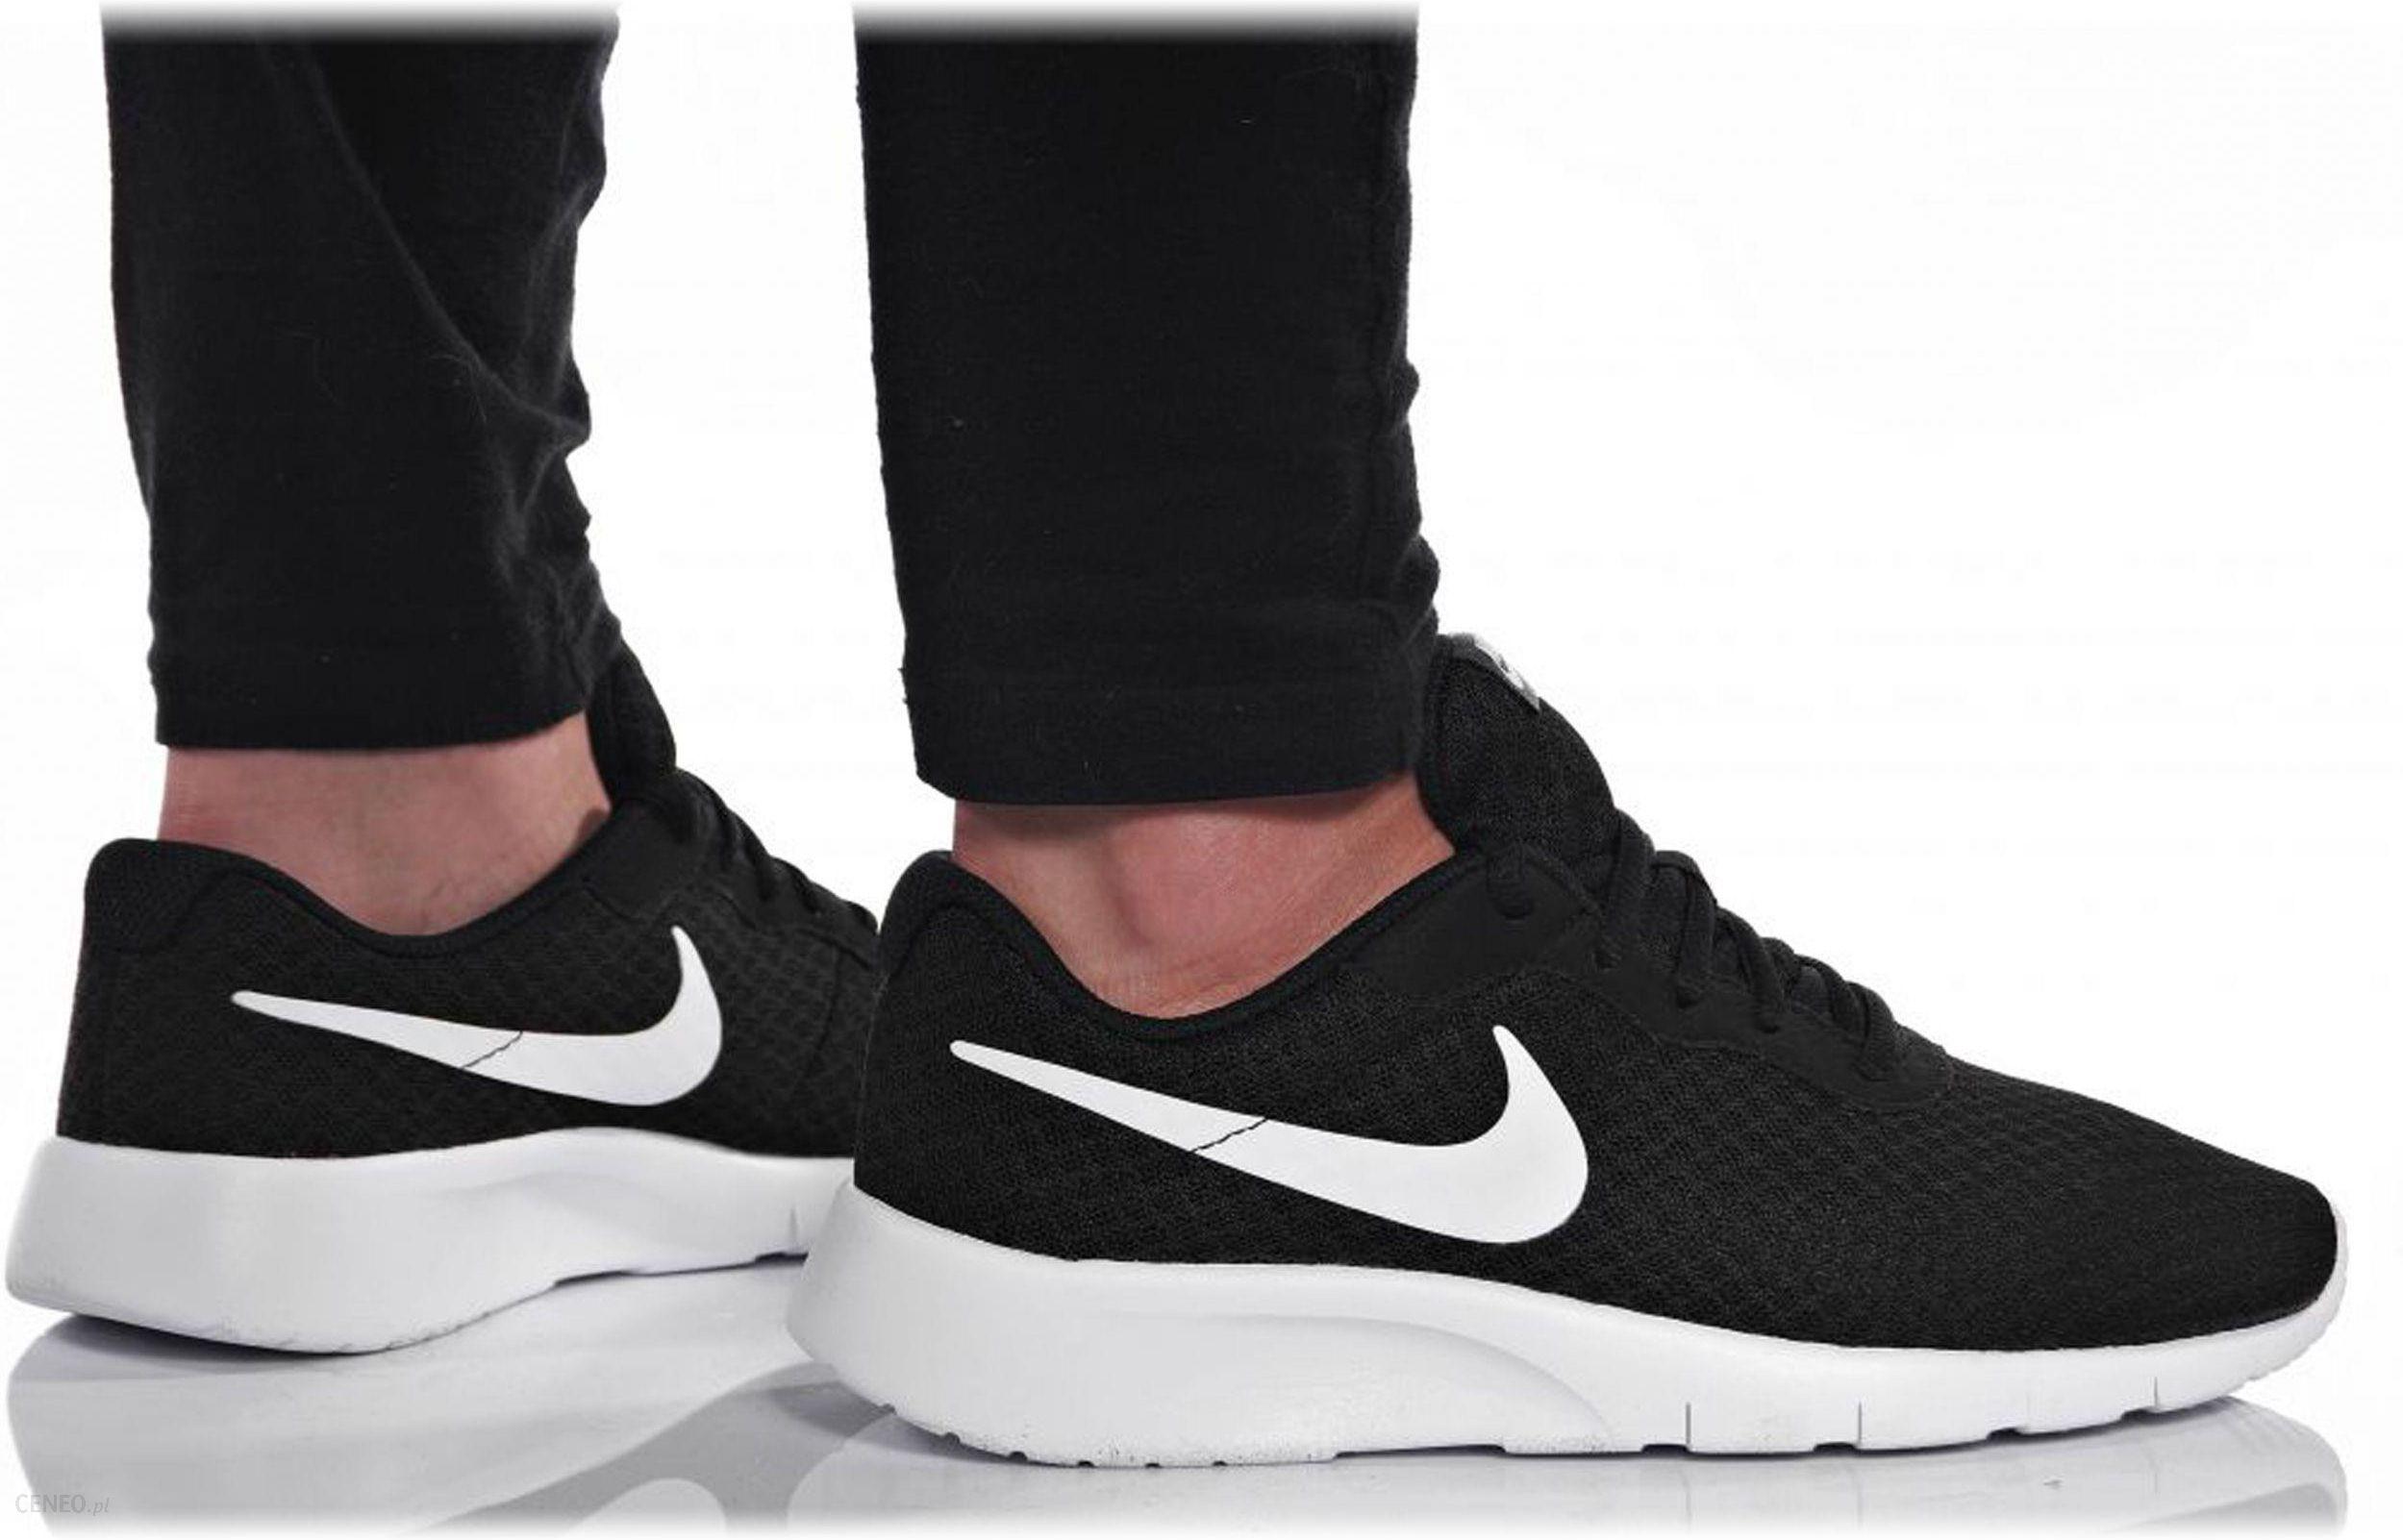 check out 9e1fd b7c82 Buty Nike Tanjun Damskie 818381-011 Czarne - zdjęcie 1